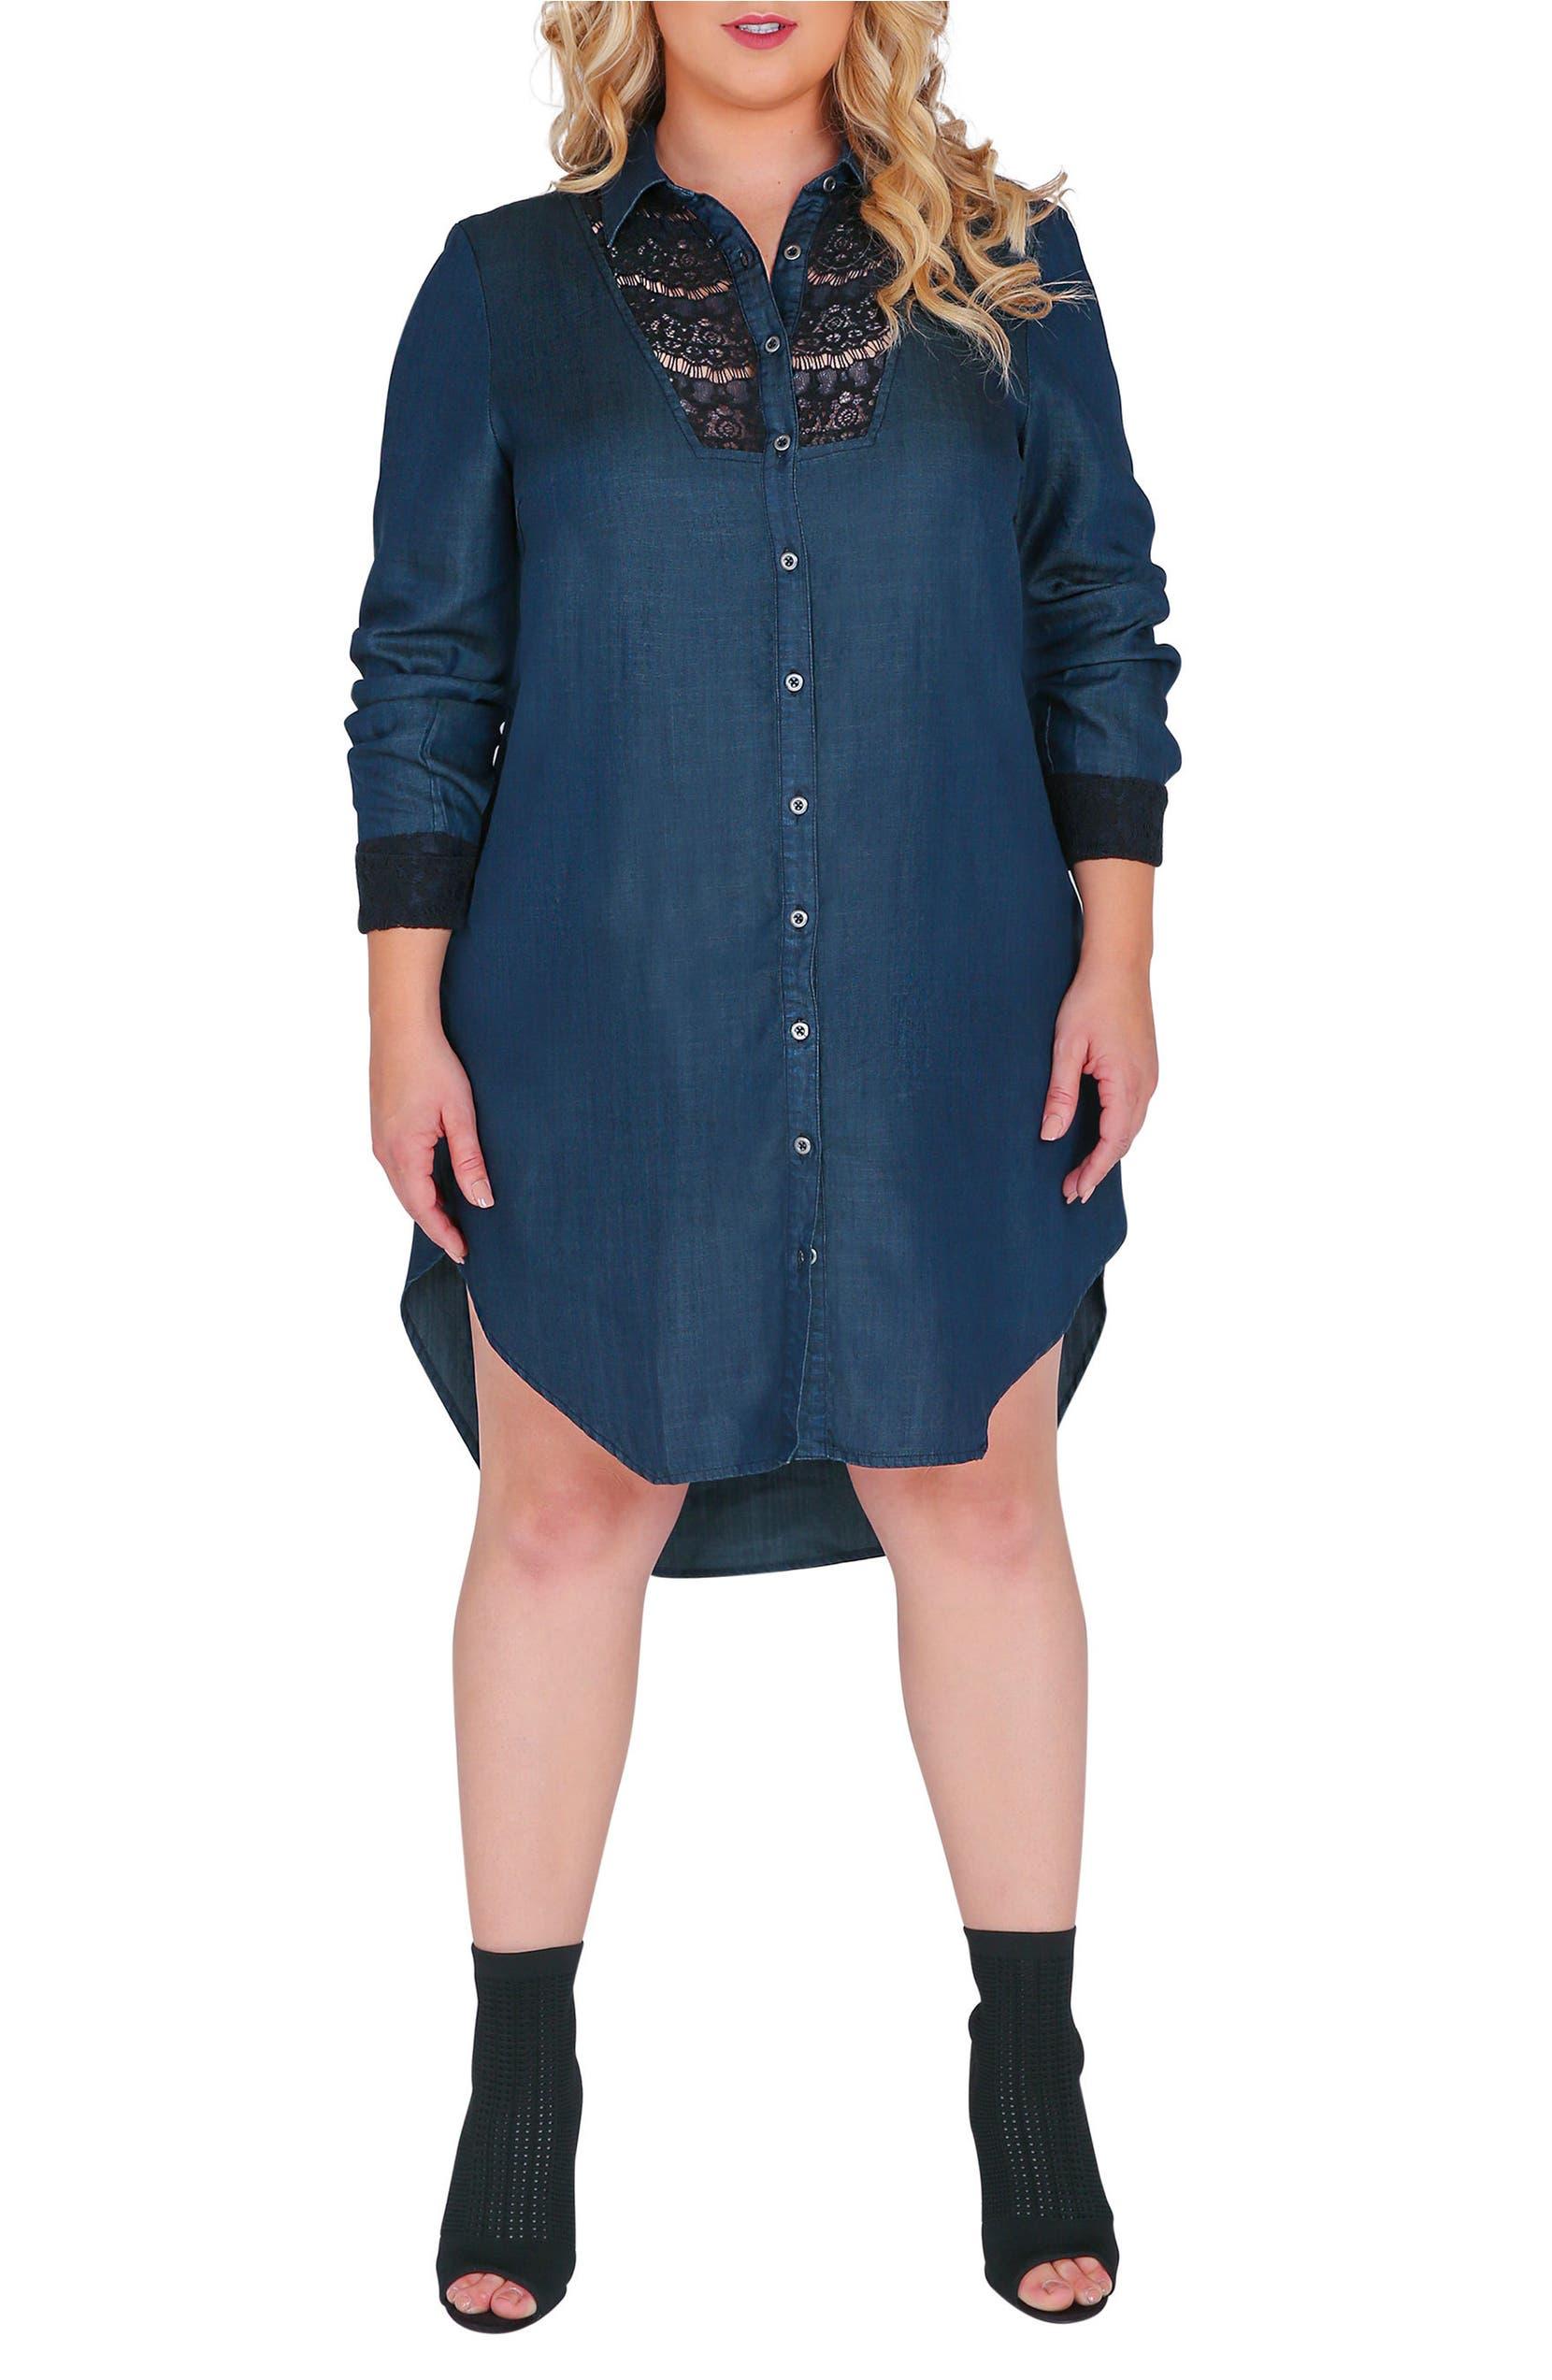 Felicity Lace Trim Denim Shirtdress